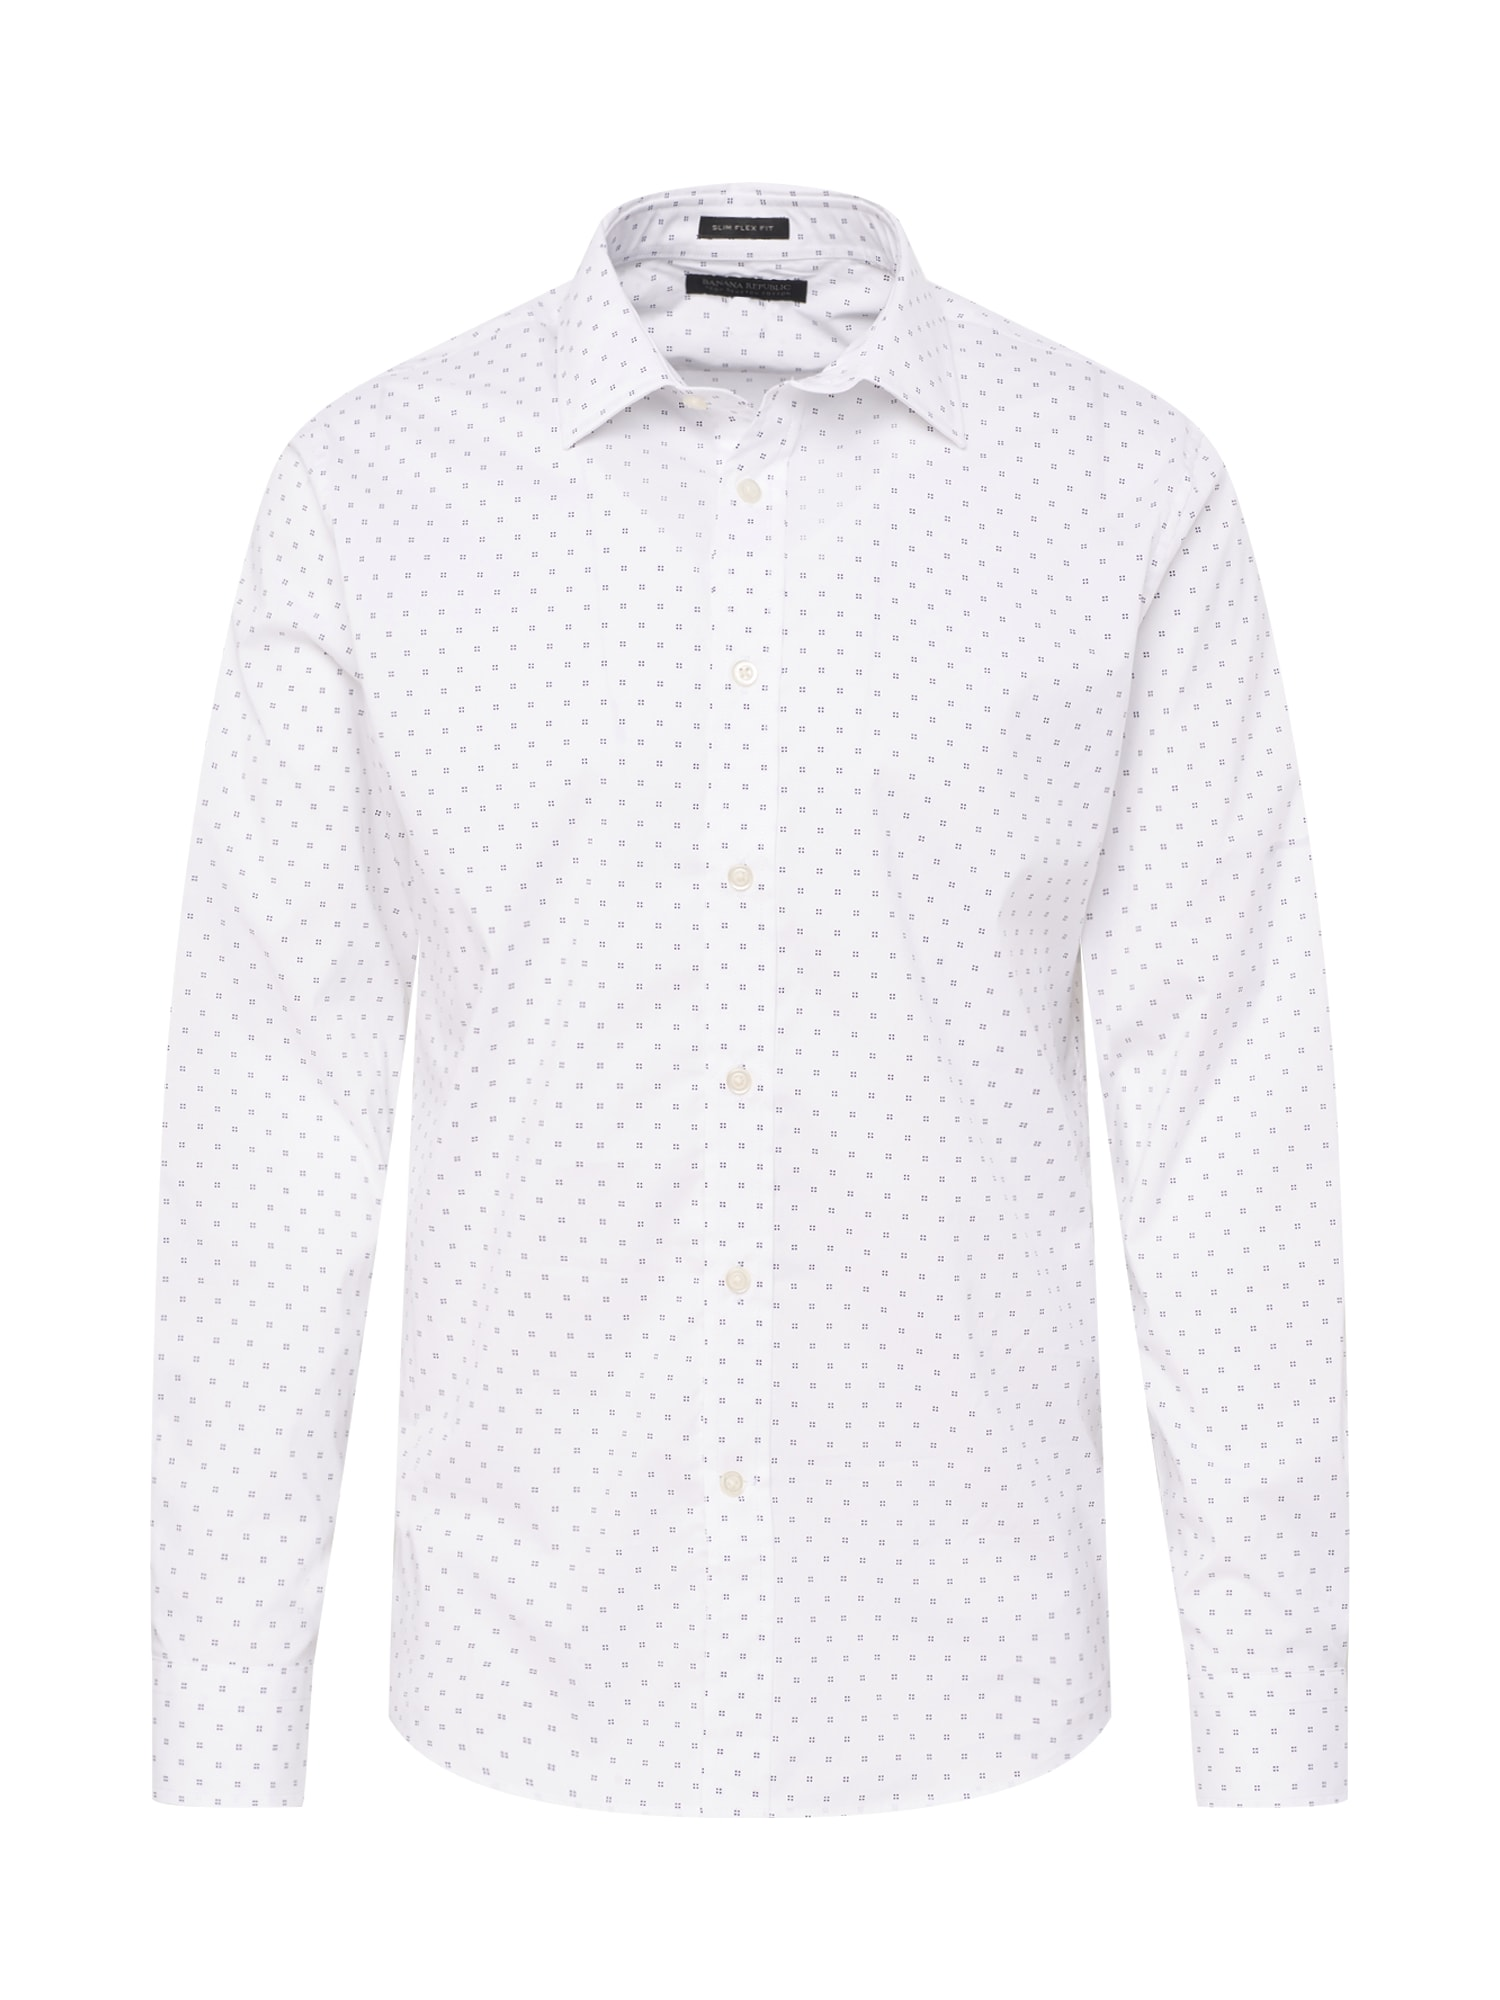 Košile TECH CLUSTER DOT PRINT SPREAD COLLAR bílá Banana Republic